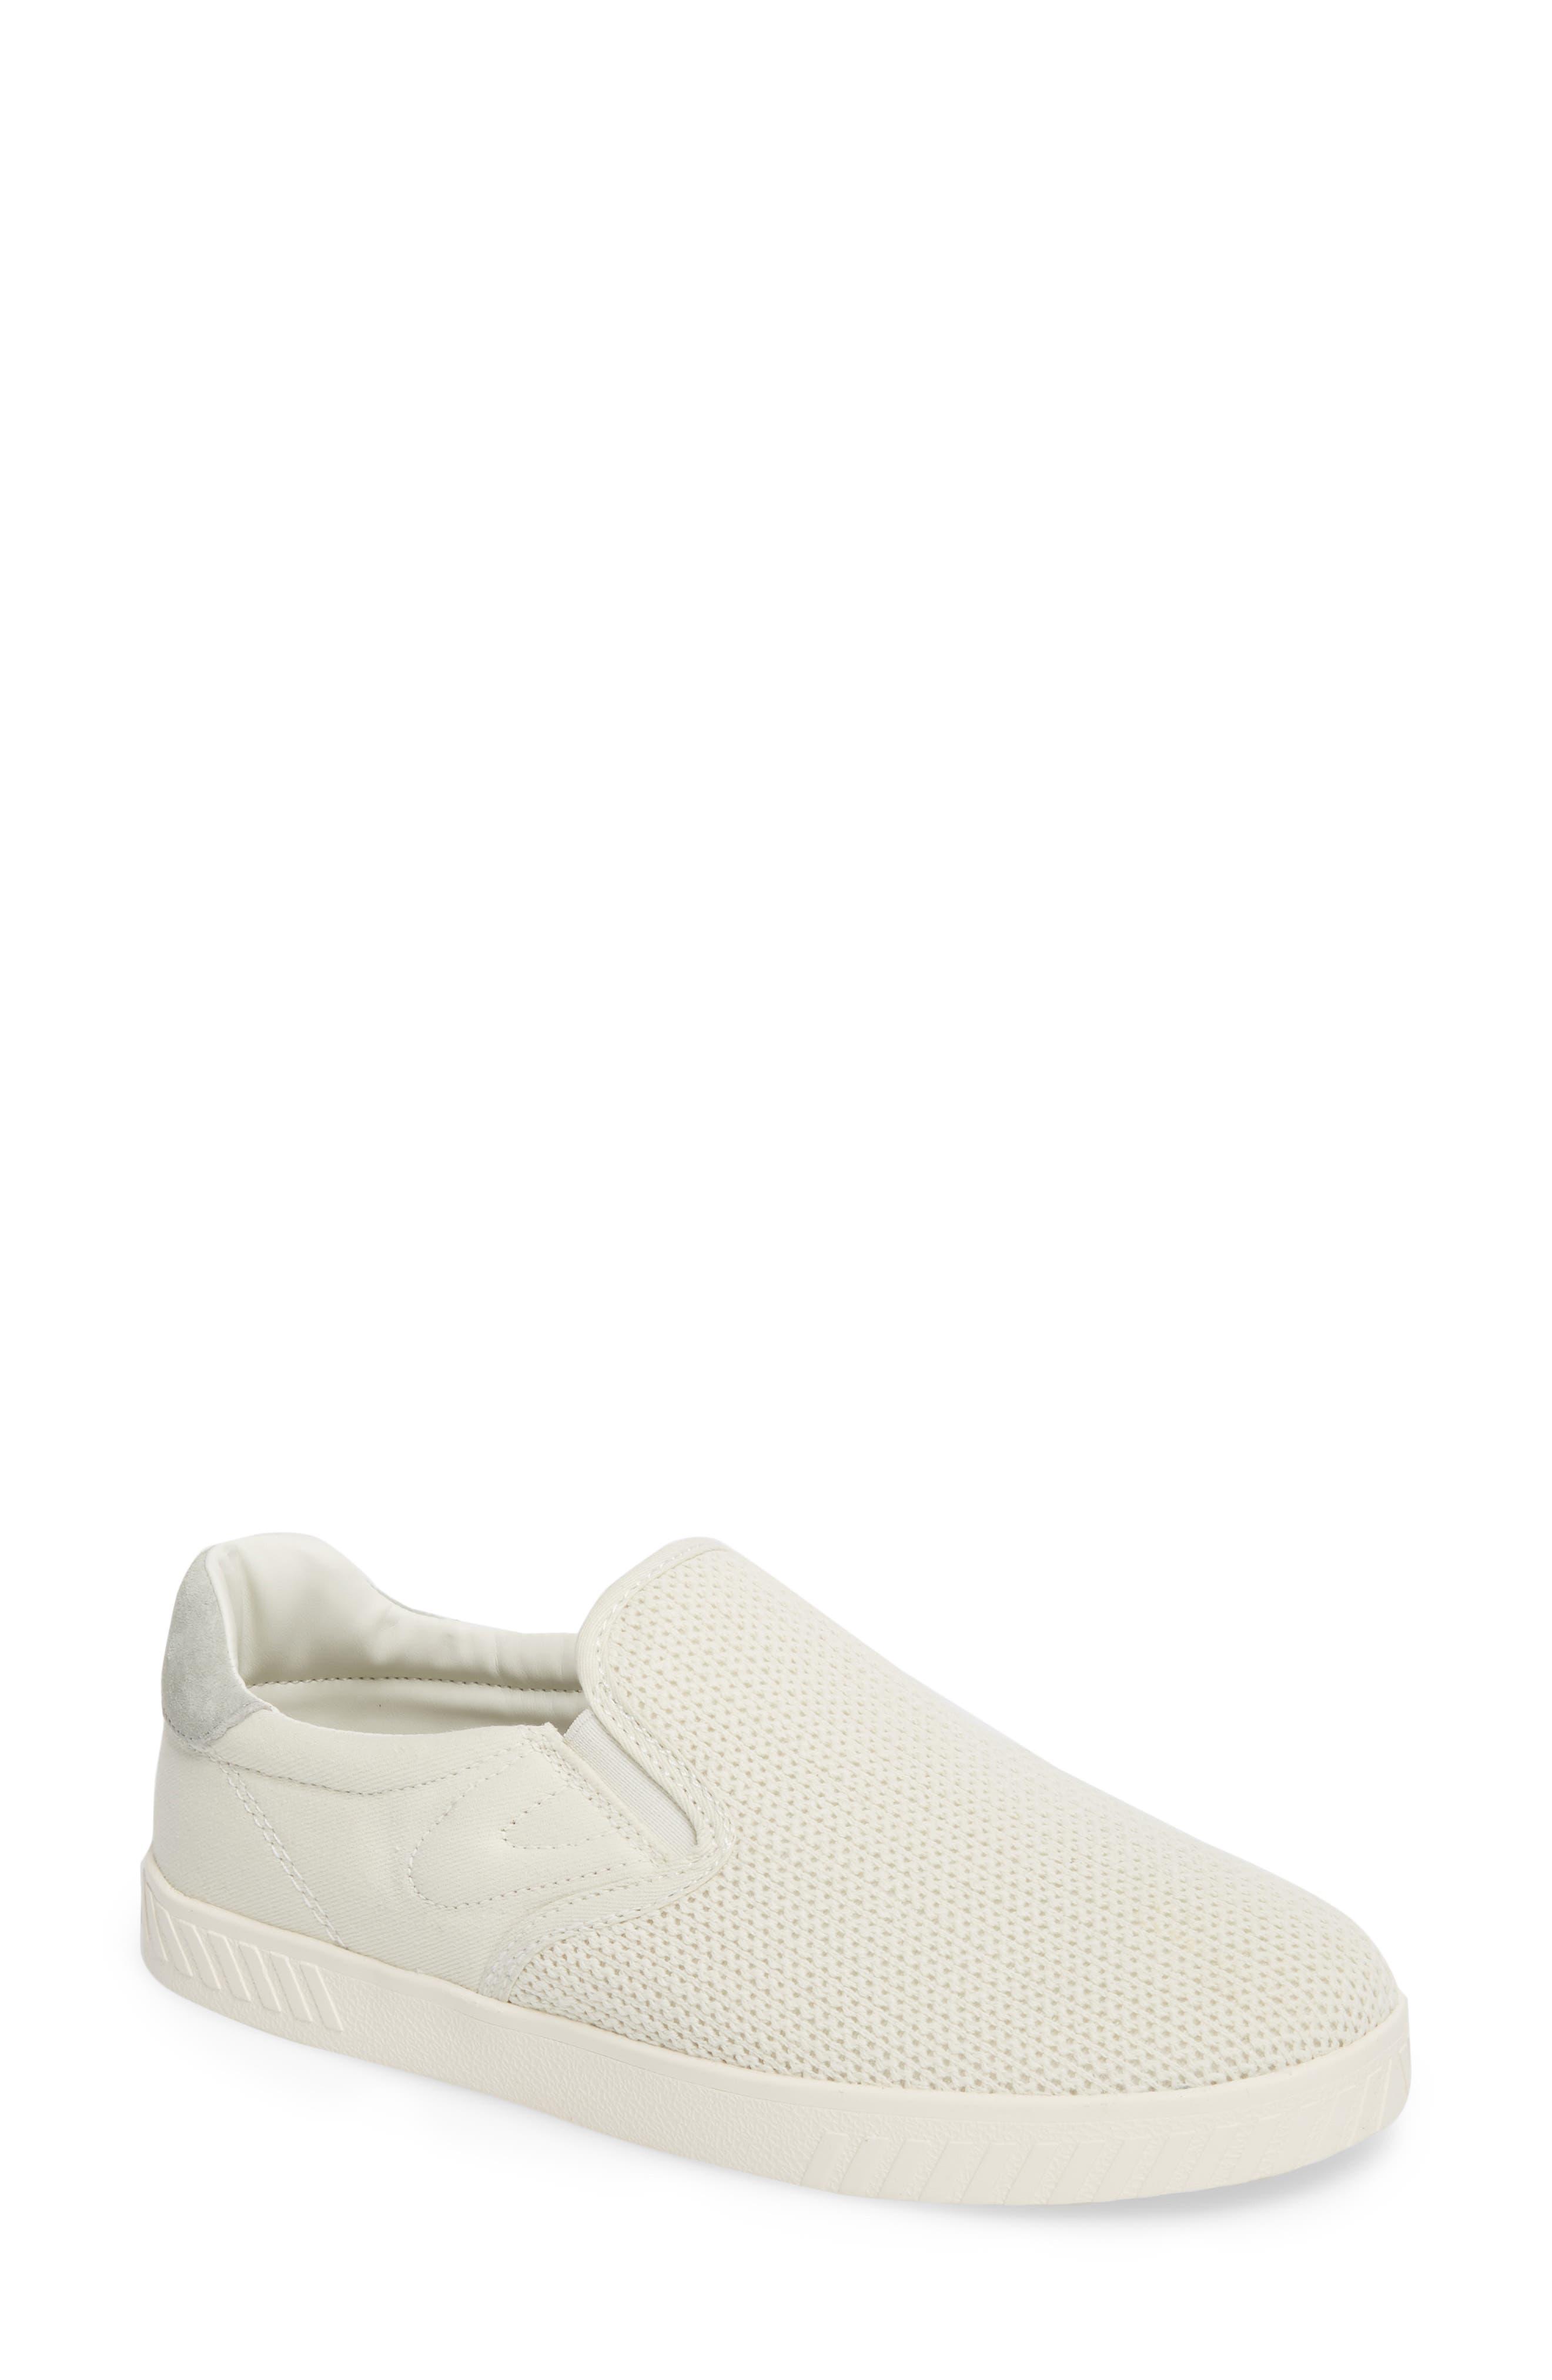 Cruz Mesh Slip-On Sneaker,                         Main,                         color, Vintage White